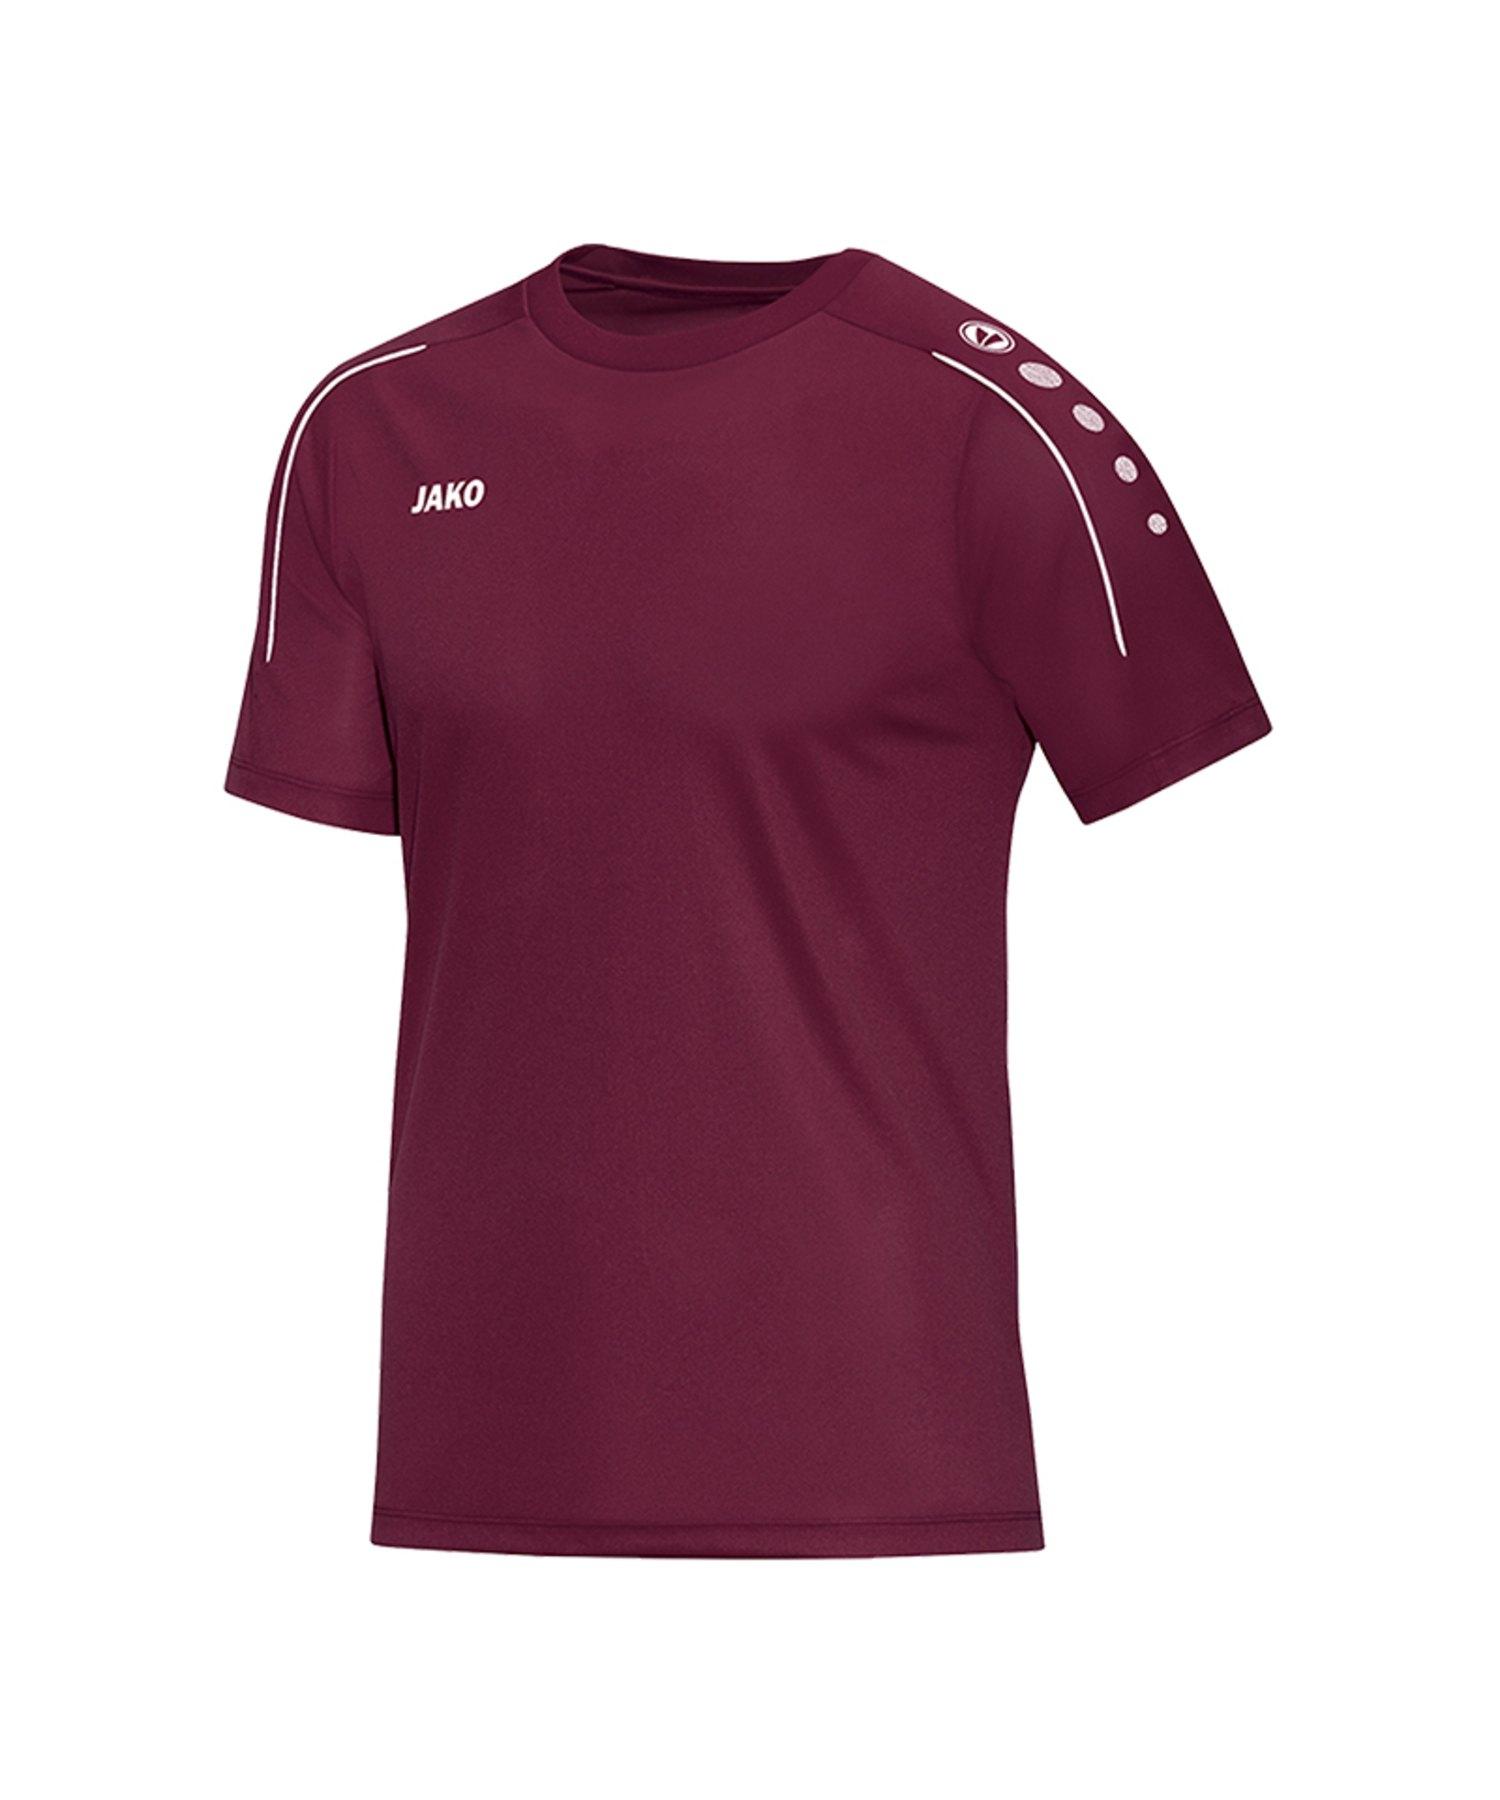 Jako Classico T-Shirt Kids Weinrot F14 - Rot